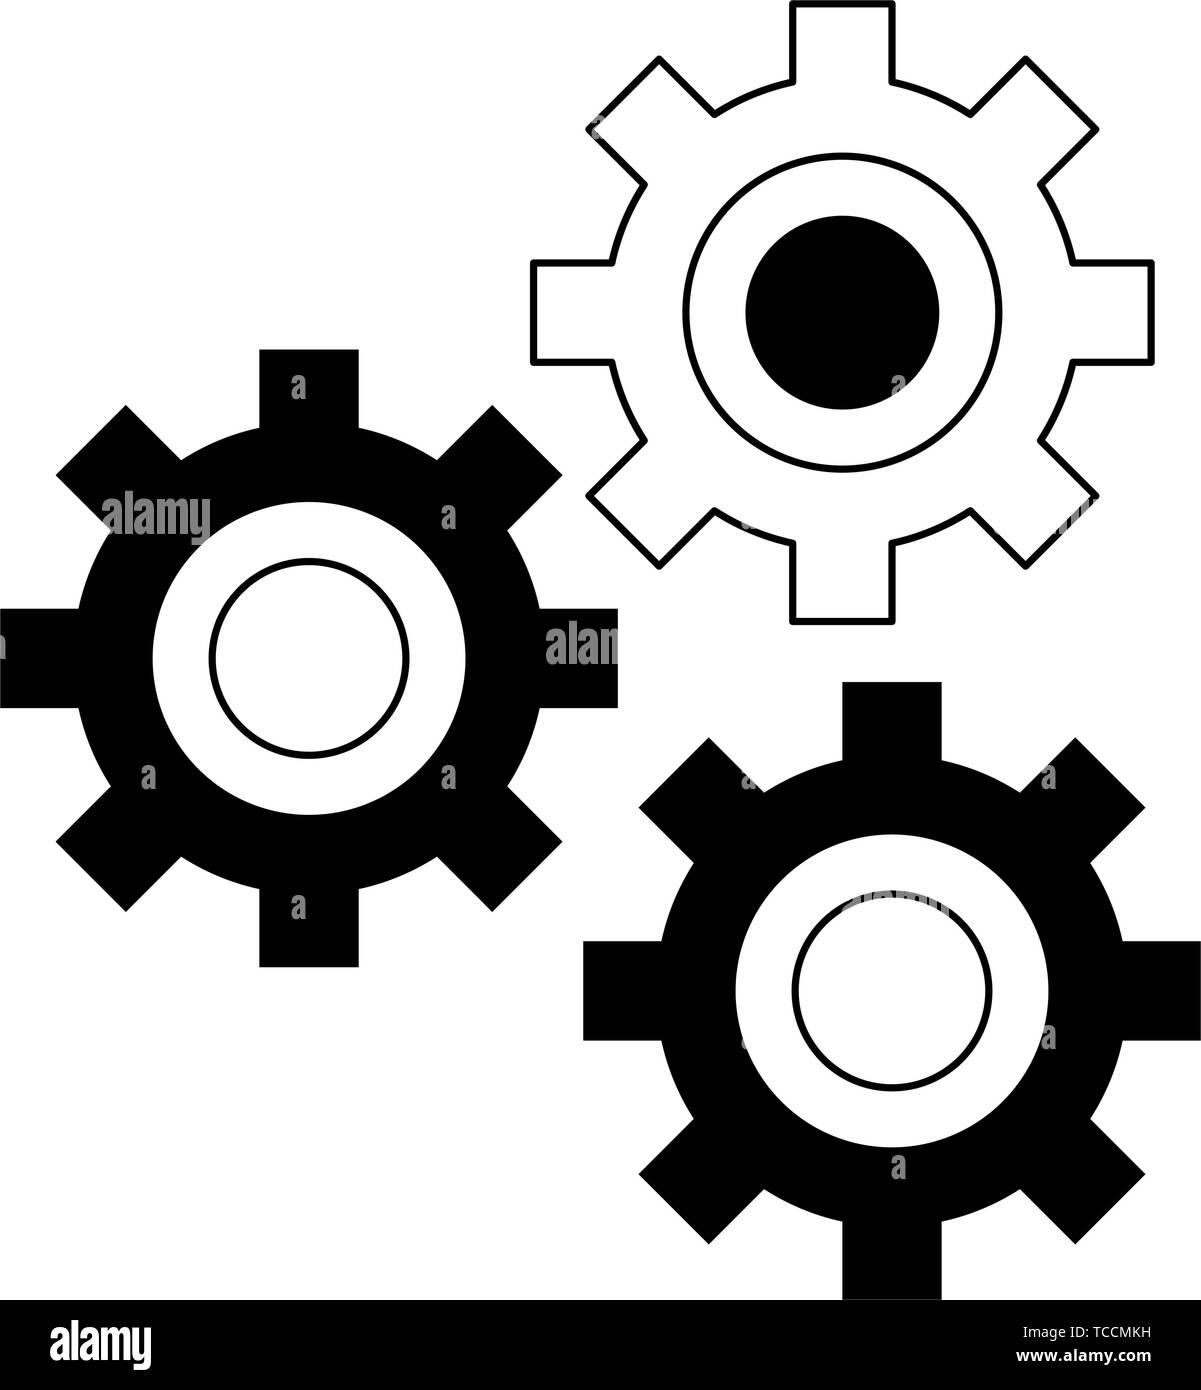 Wheel Industry Stock Photos & Wheel Industry Stock Images